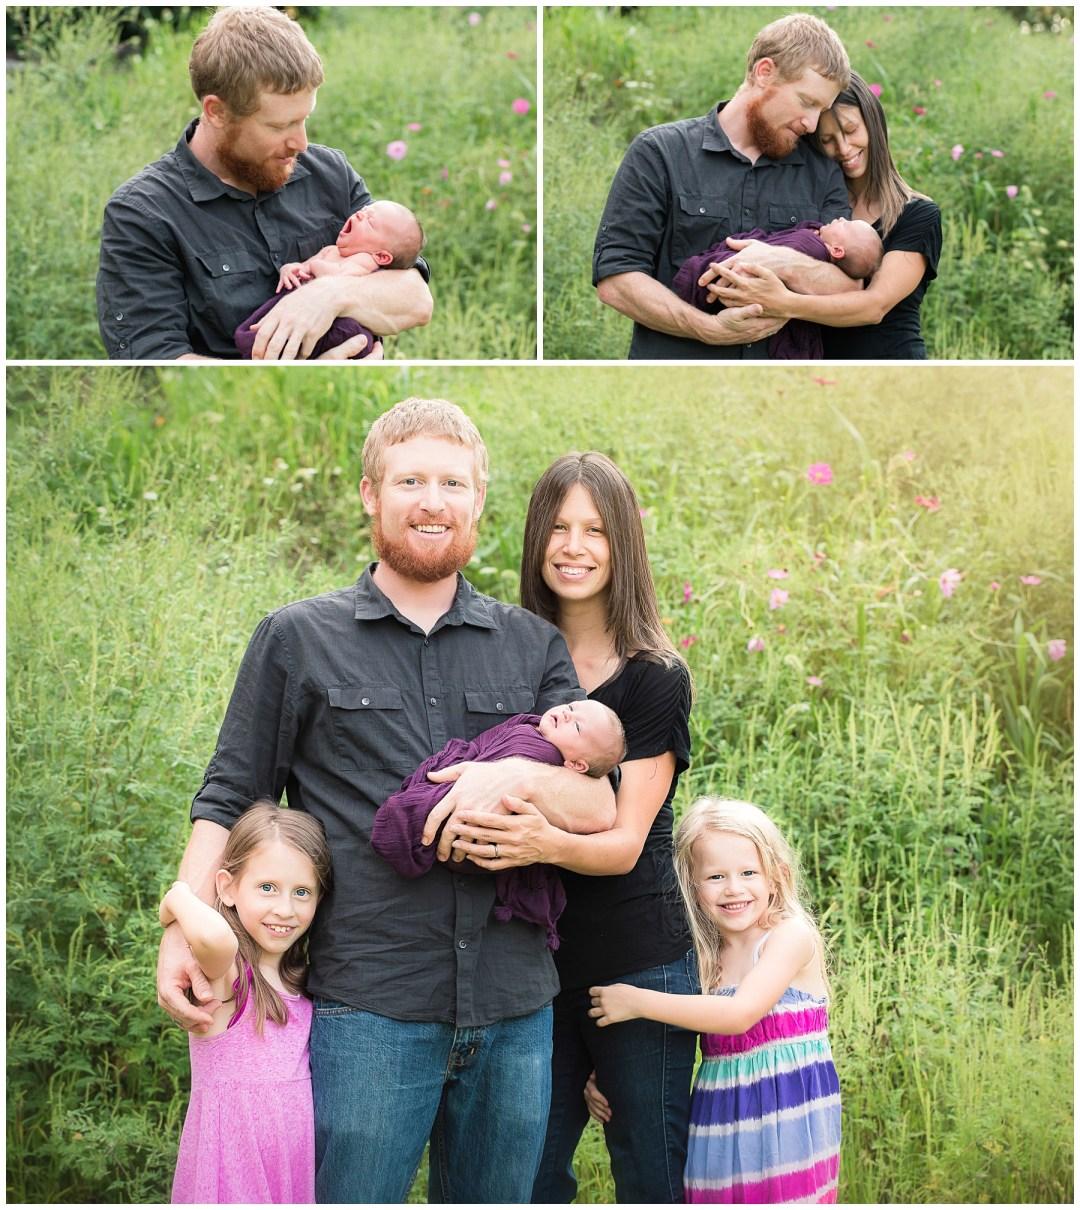 Newborn Photographer Berks County PA